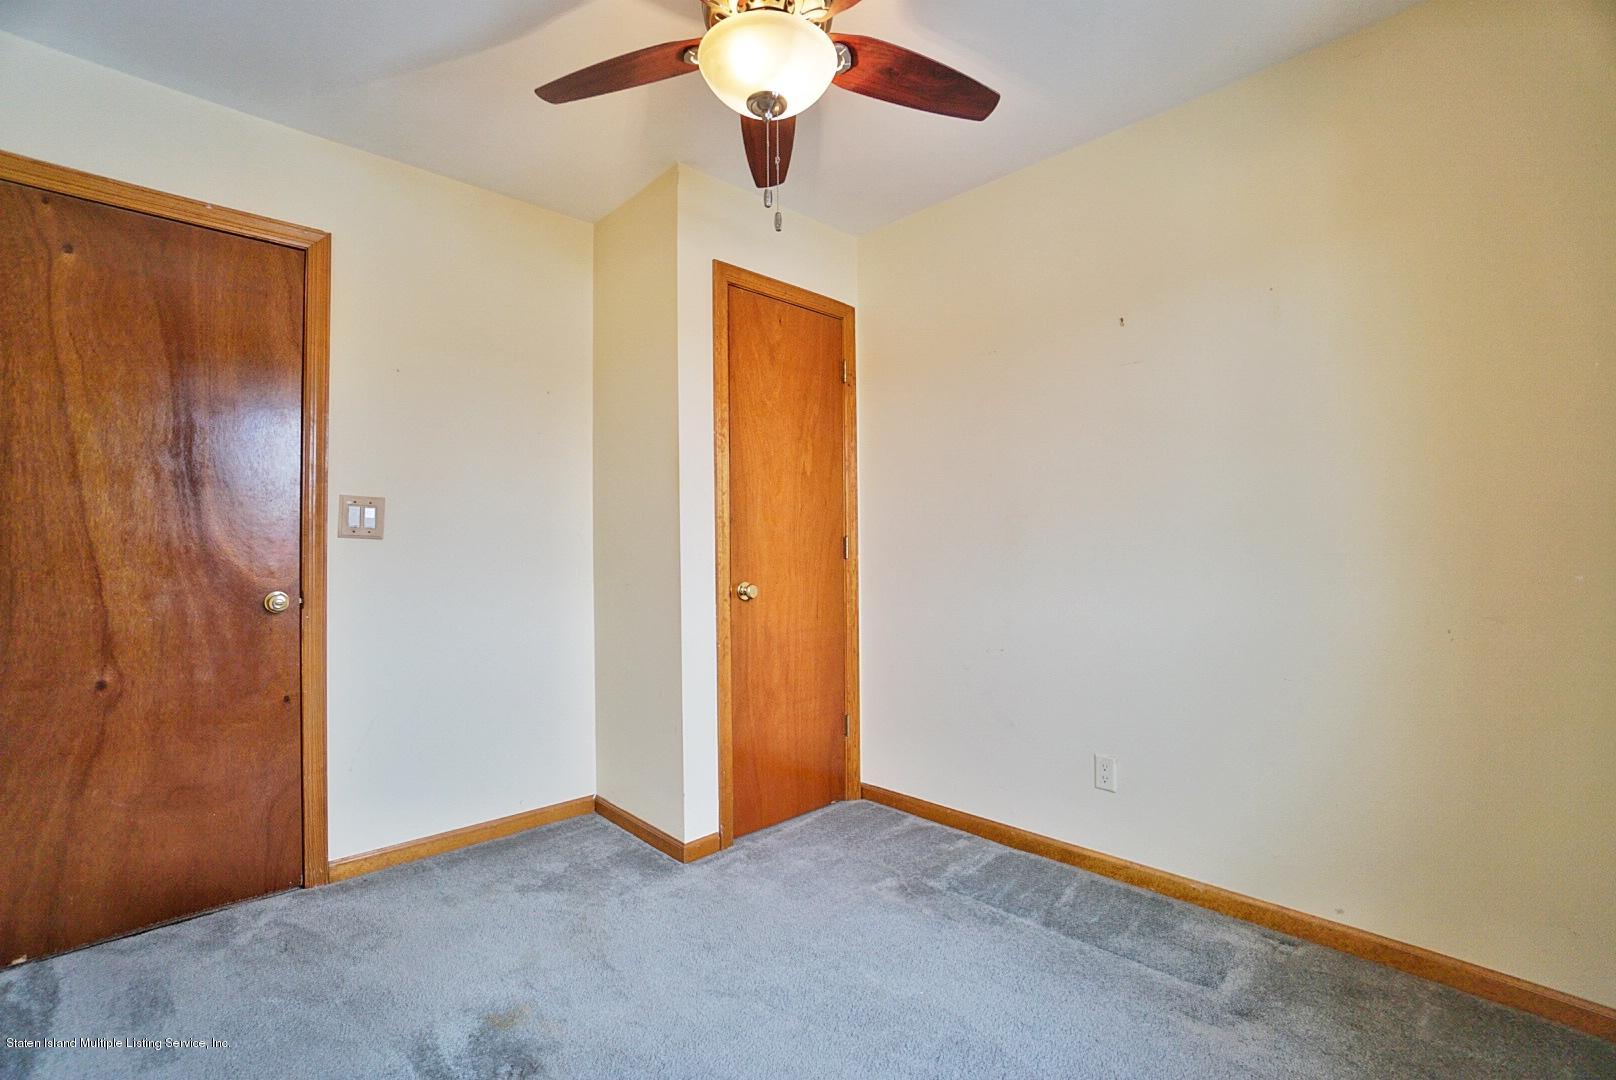 Single Family - Detached 55 Lyndale Avenue  Staten Island, NY 10312, MLS-1128769-16